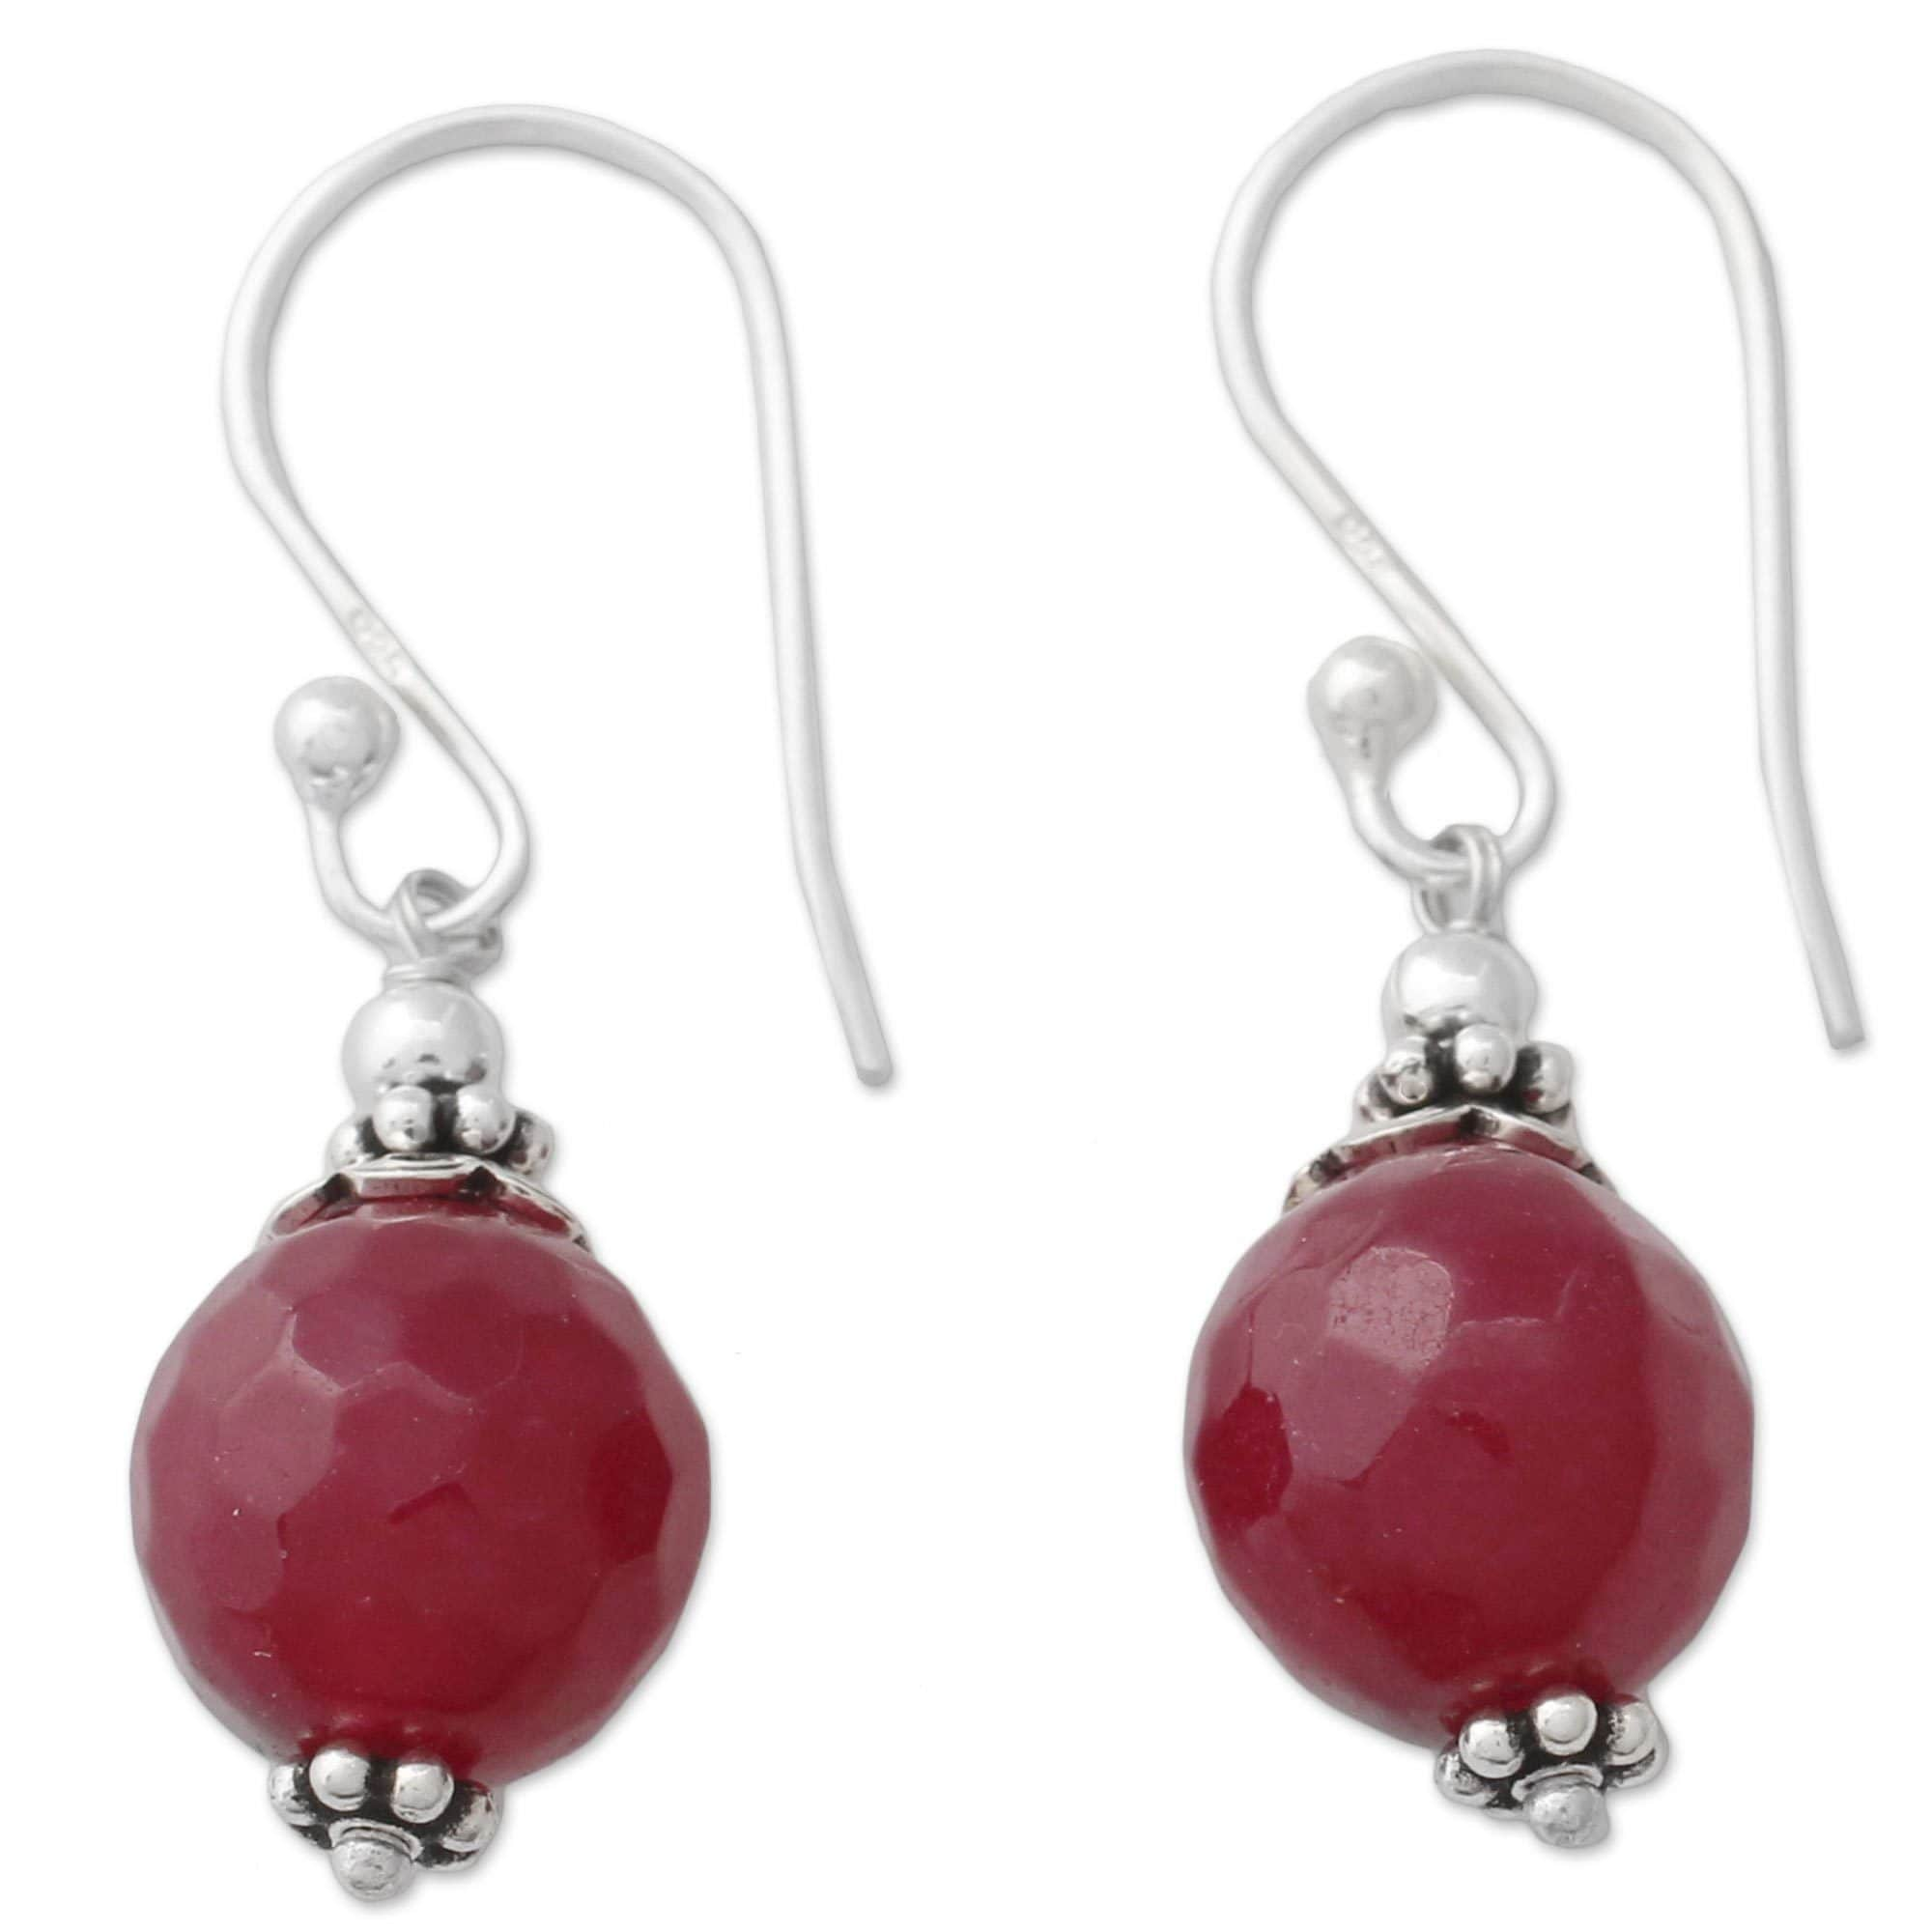 Glorious Red Agate Earrings